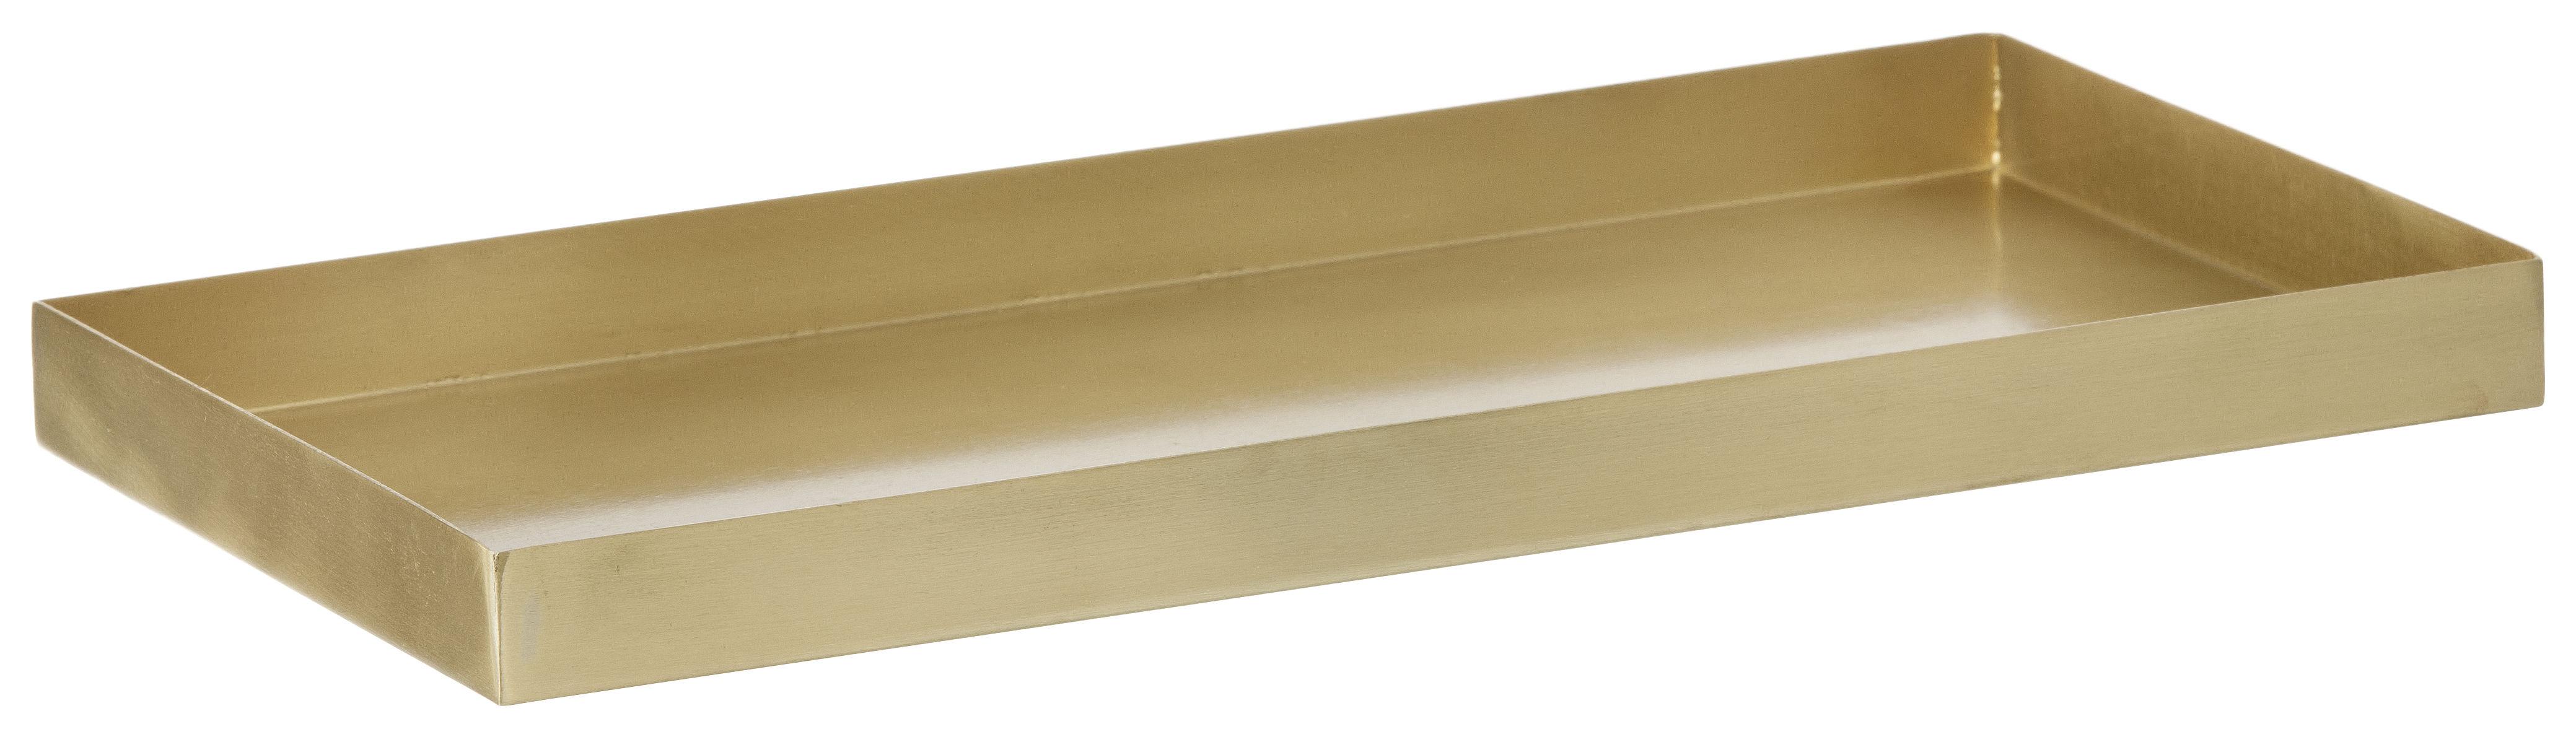 Accessoires - Accessoires für das Büro - Brass Tablett / Ablage - 15 x 30 cm - Ferm Living - Messing - Messing